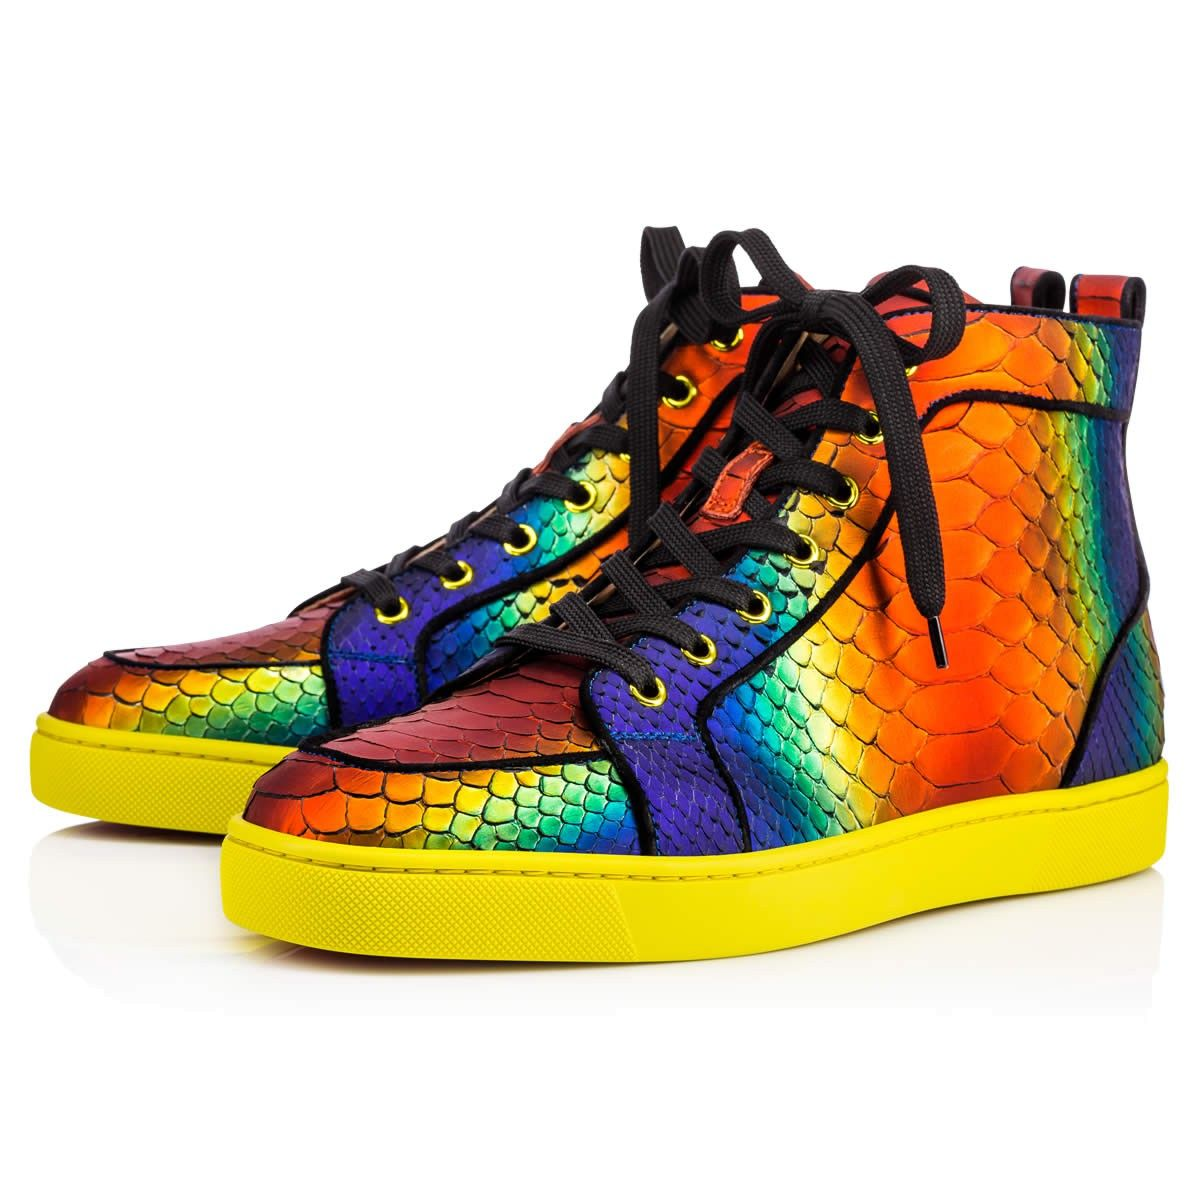 separation shoes a28b1 e5b05 CHRISTIAN LOUBOUTIN Rantus Orlato Men'S Flat Capucine Python ...